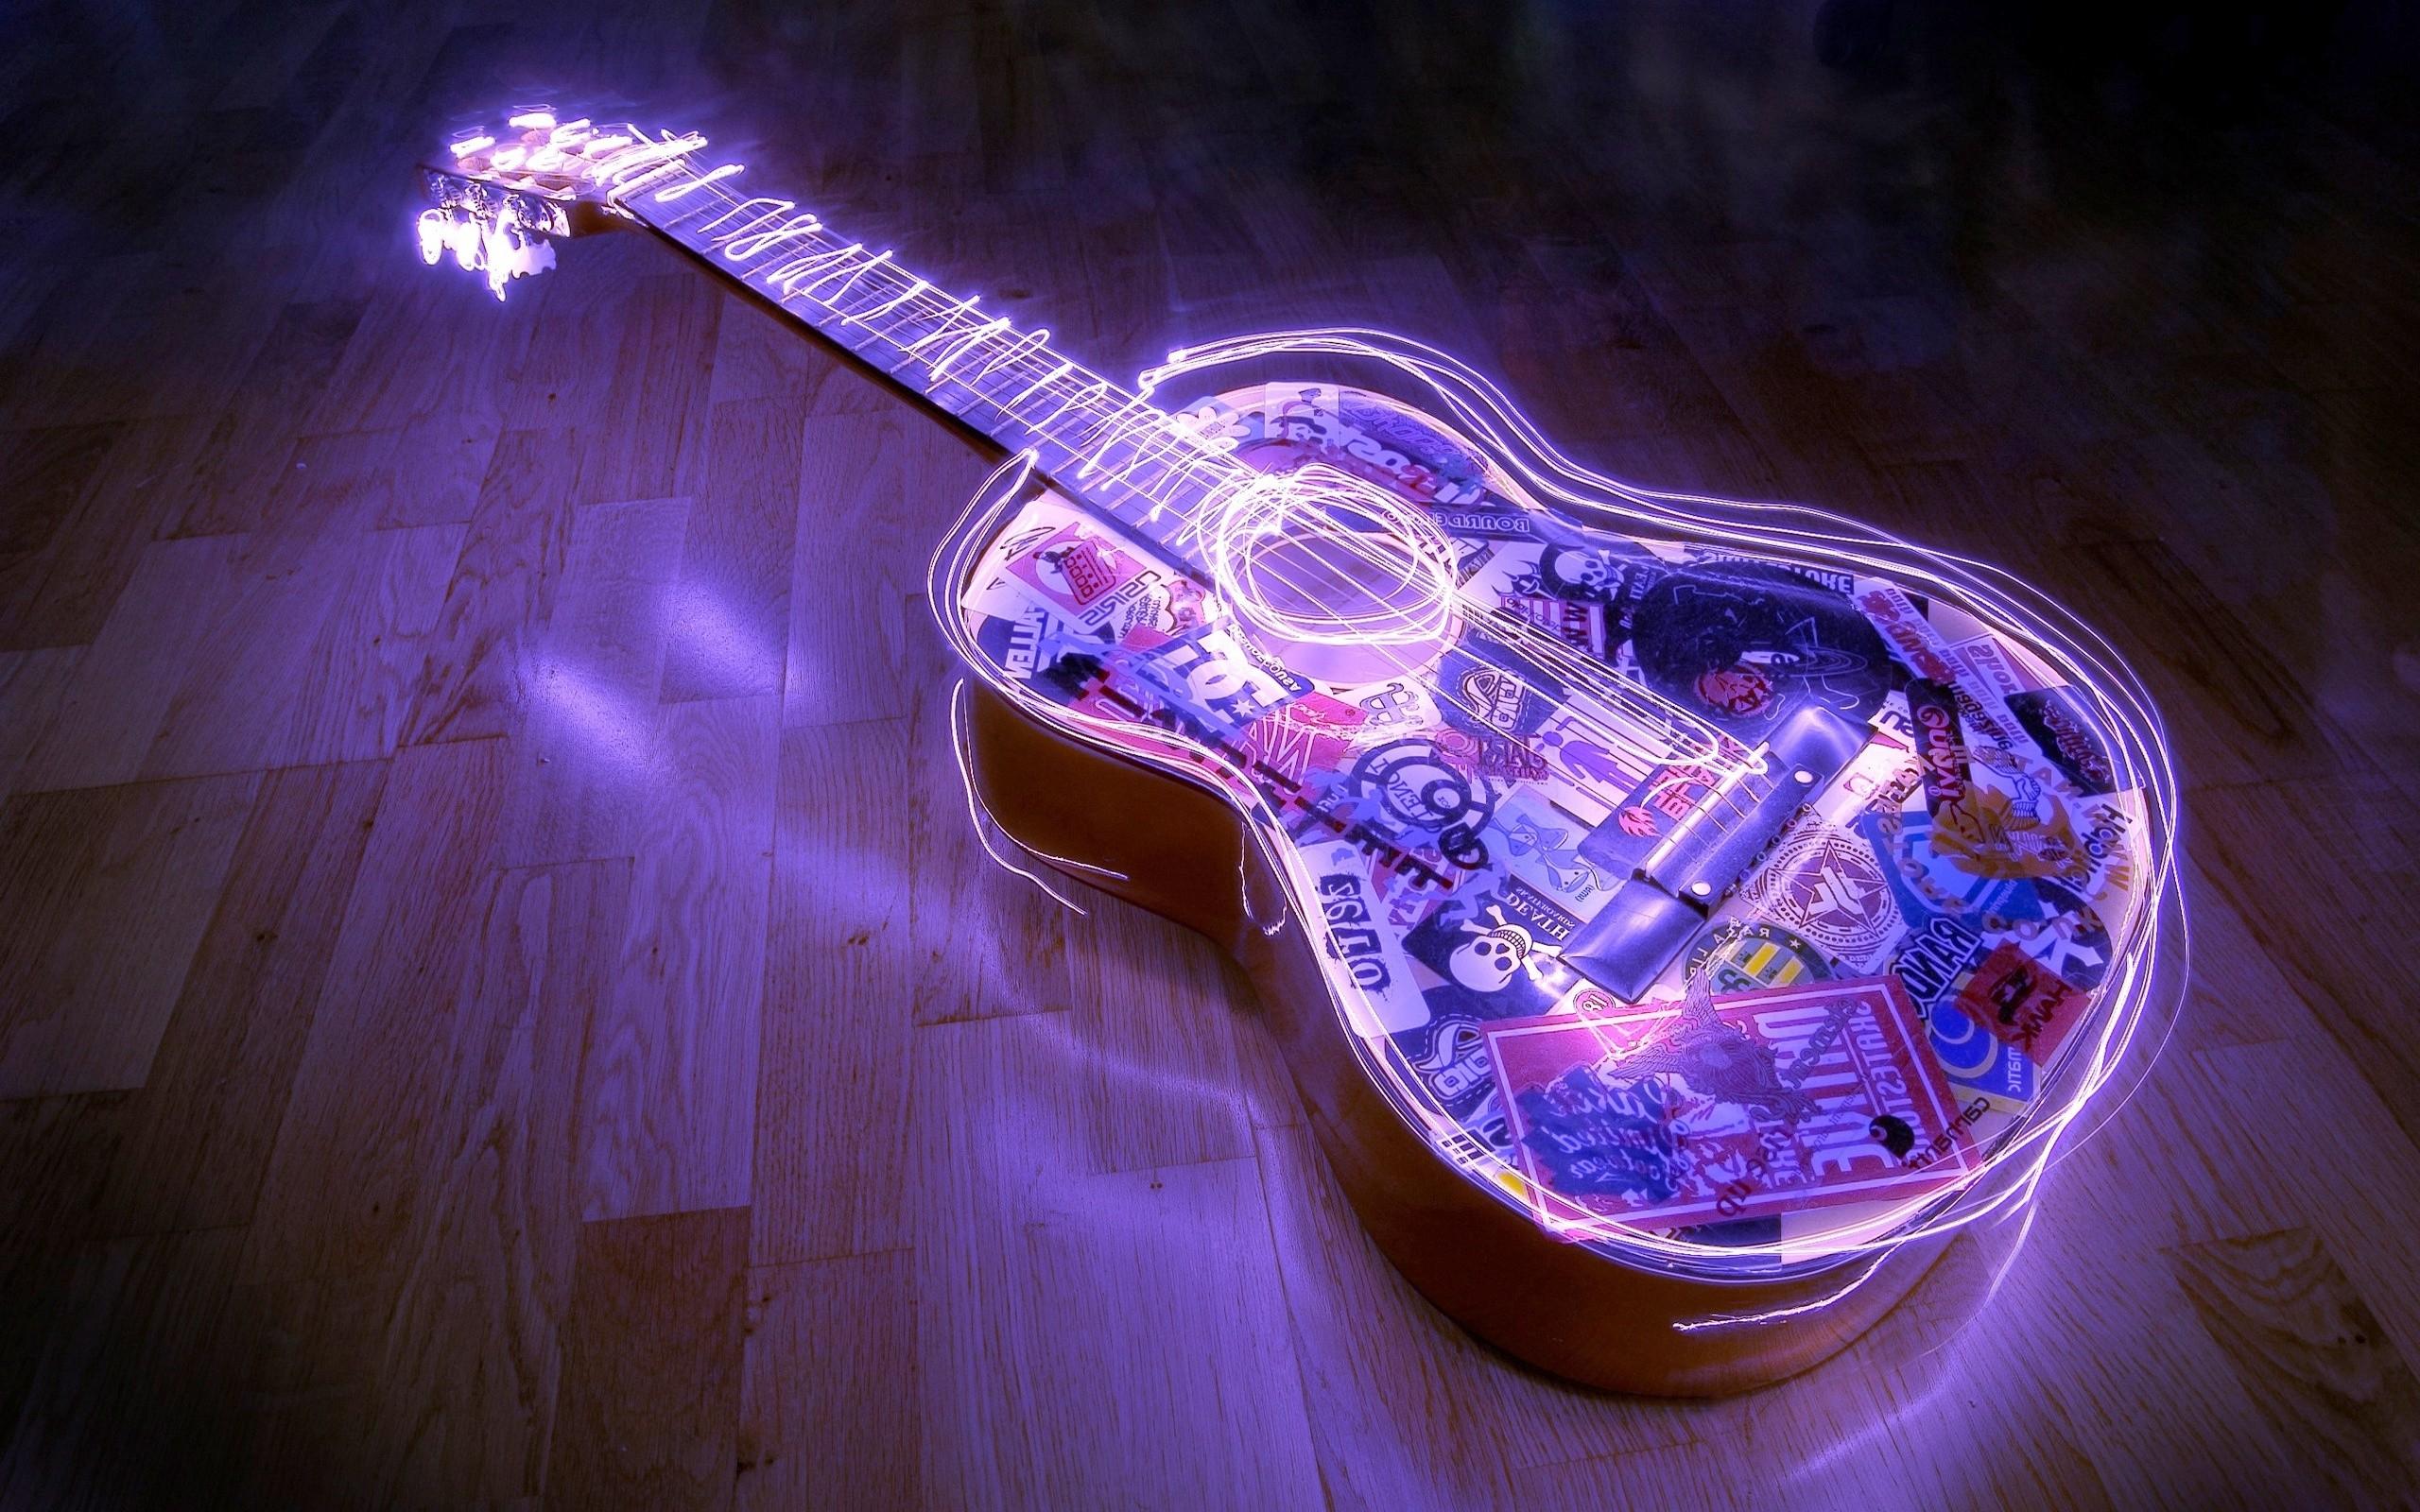 lights-on-the-guitar-wallpaper-1.jpg (2560×